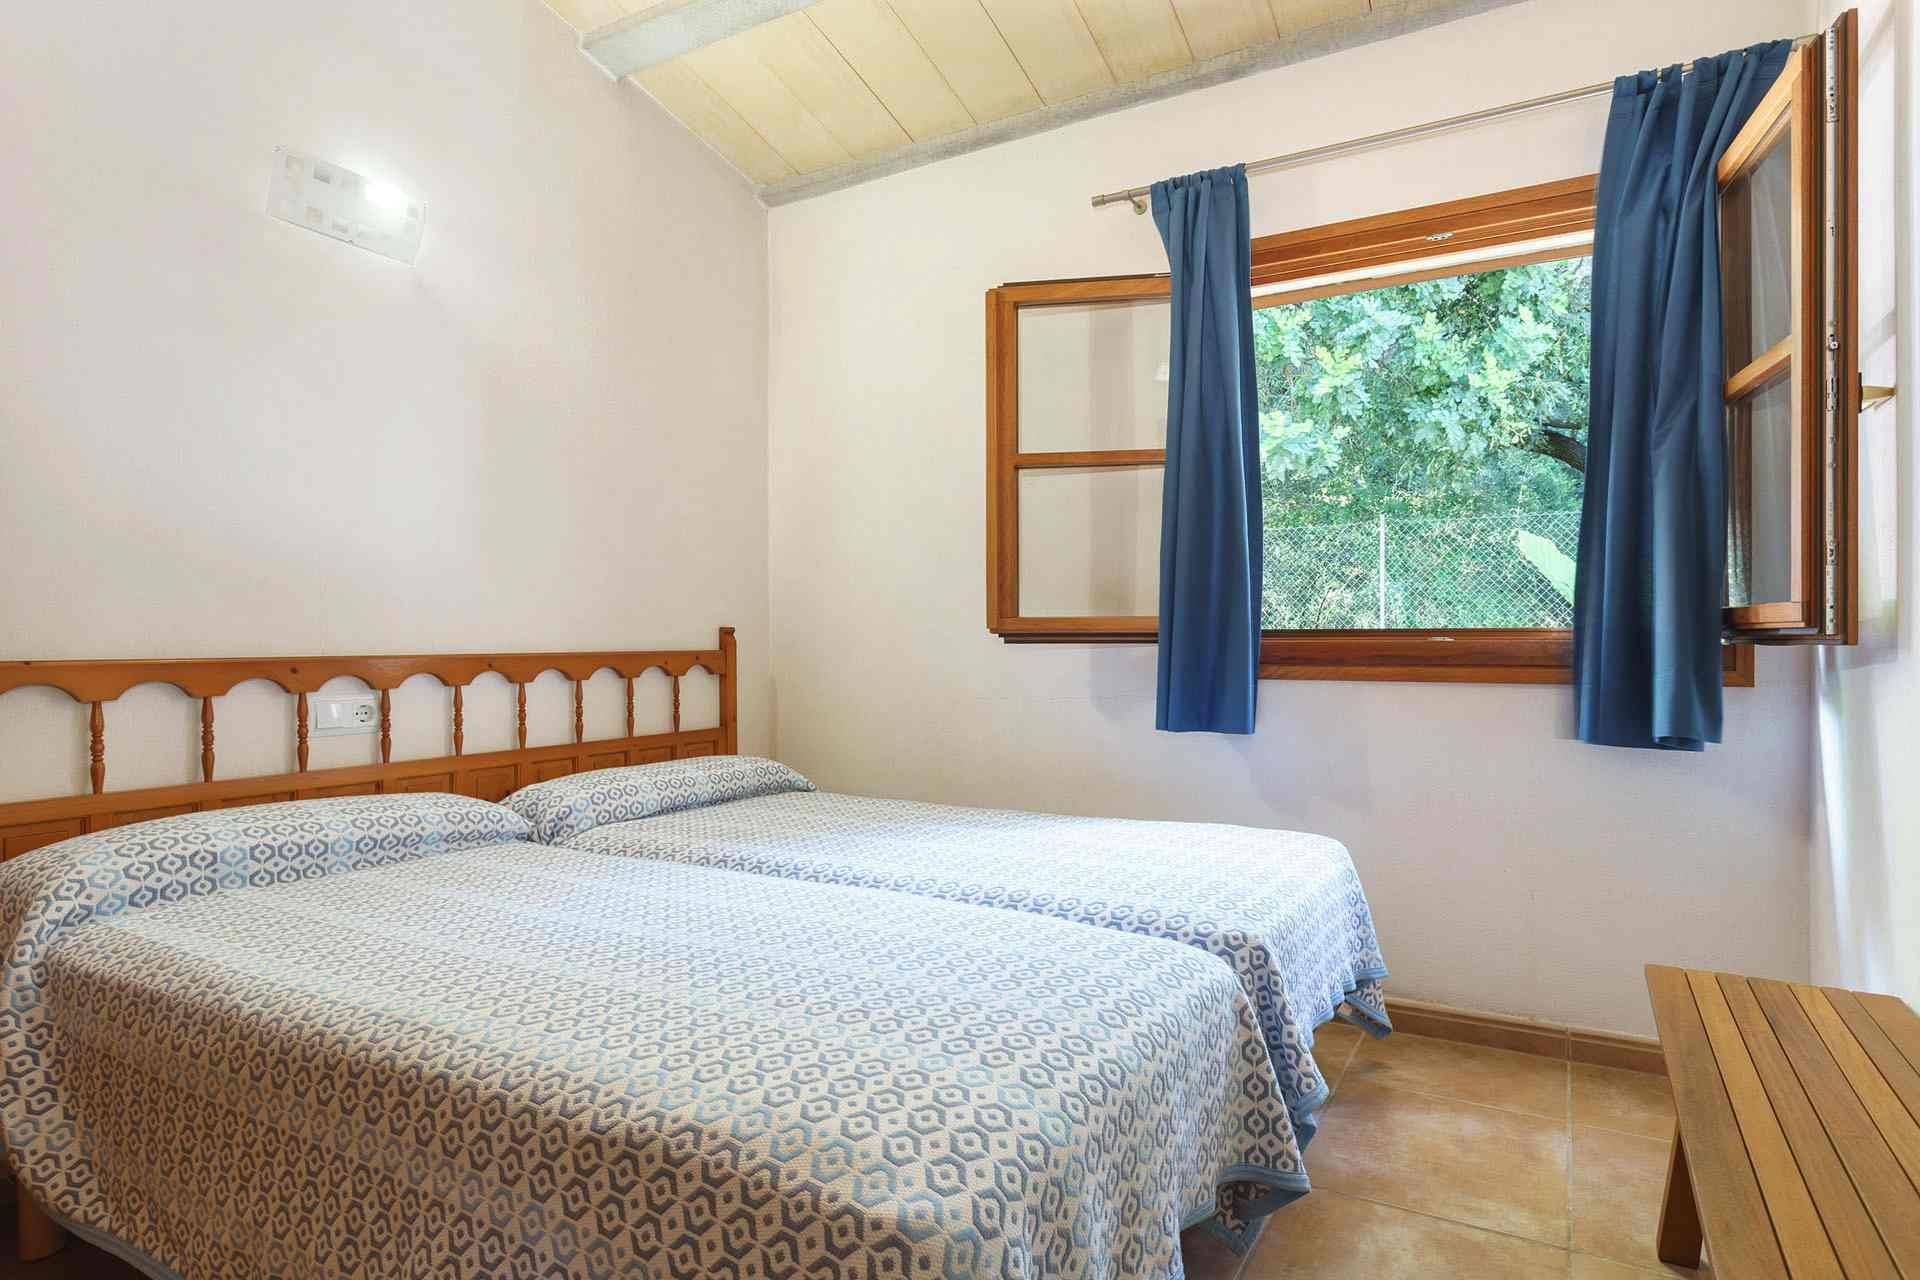 01-284 Finca mit Ausblick Mallorca Norden Bild 17